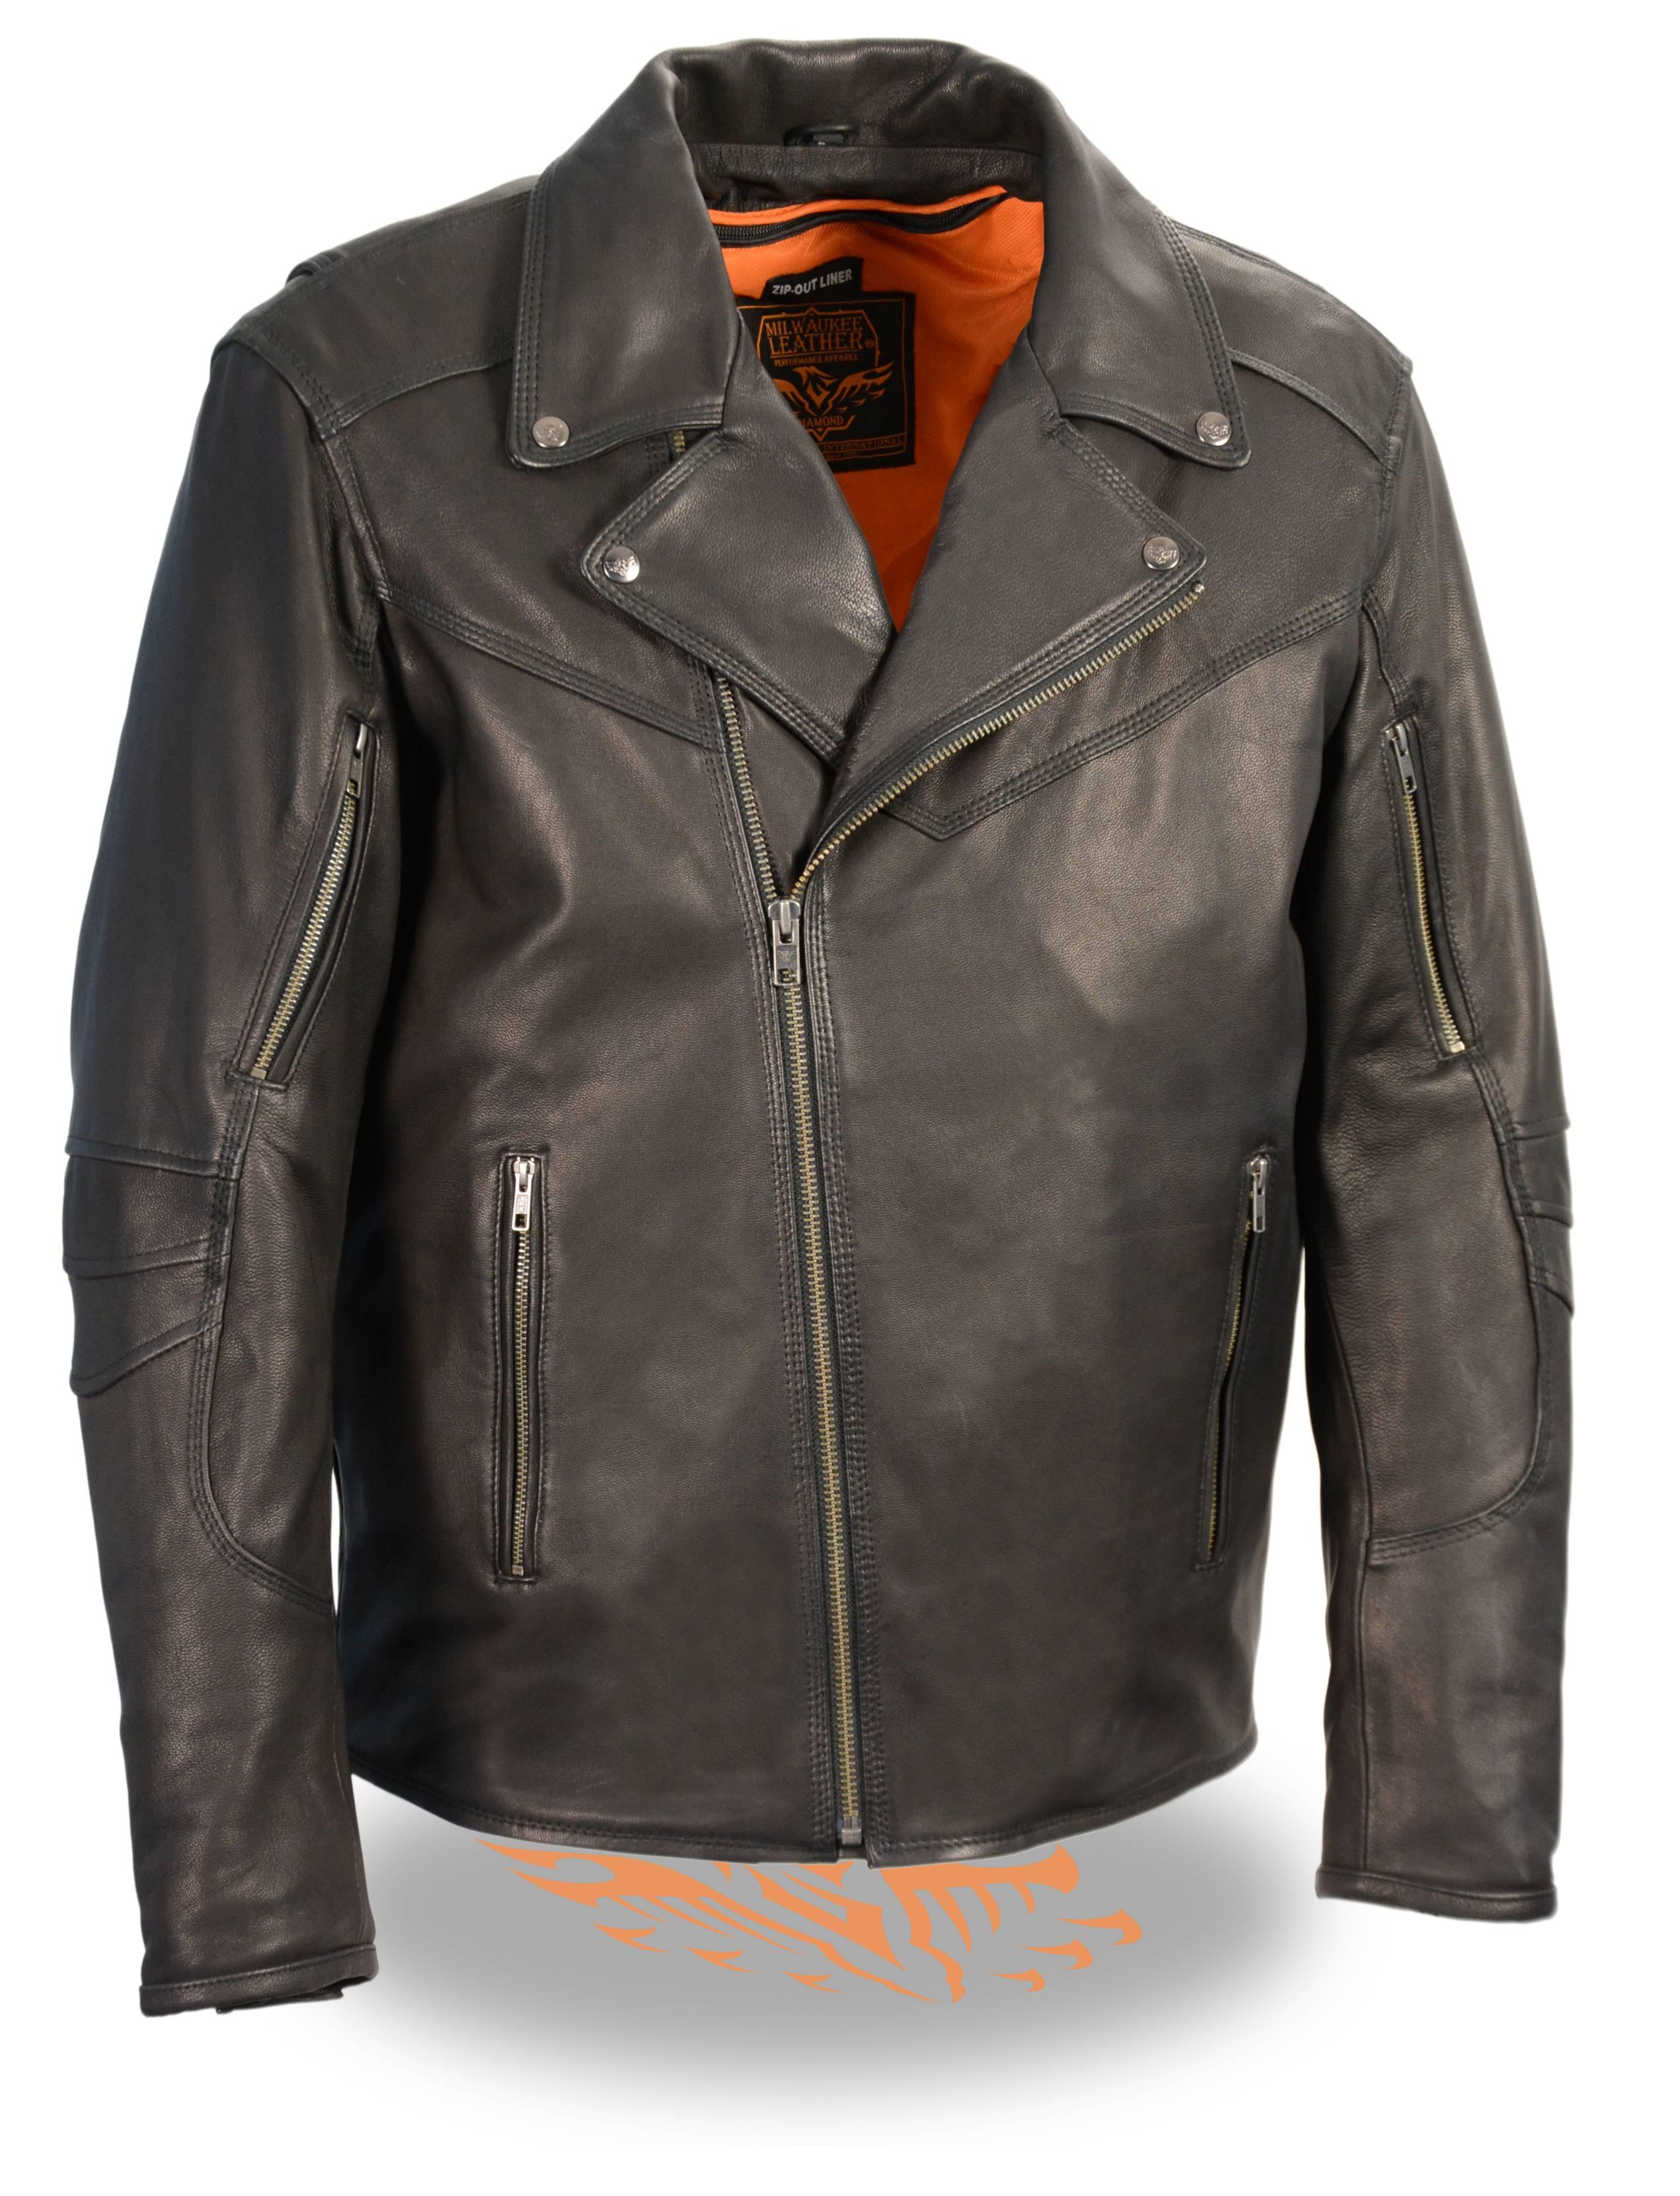 4a8e1e5b0f8 Mens Black Naked Goatskin Leather Beltless Biker Jacket Triple Stitch